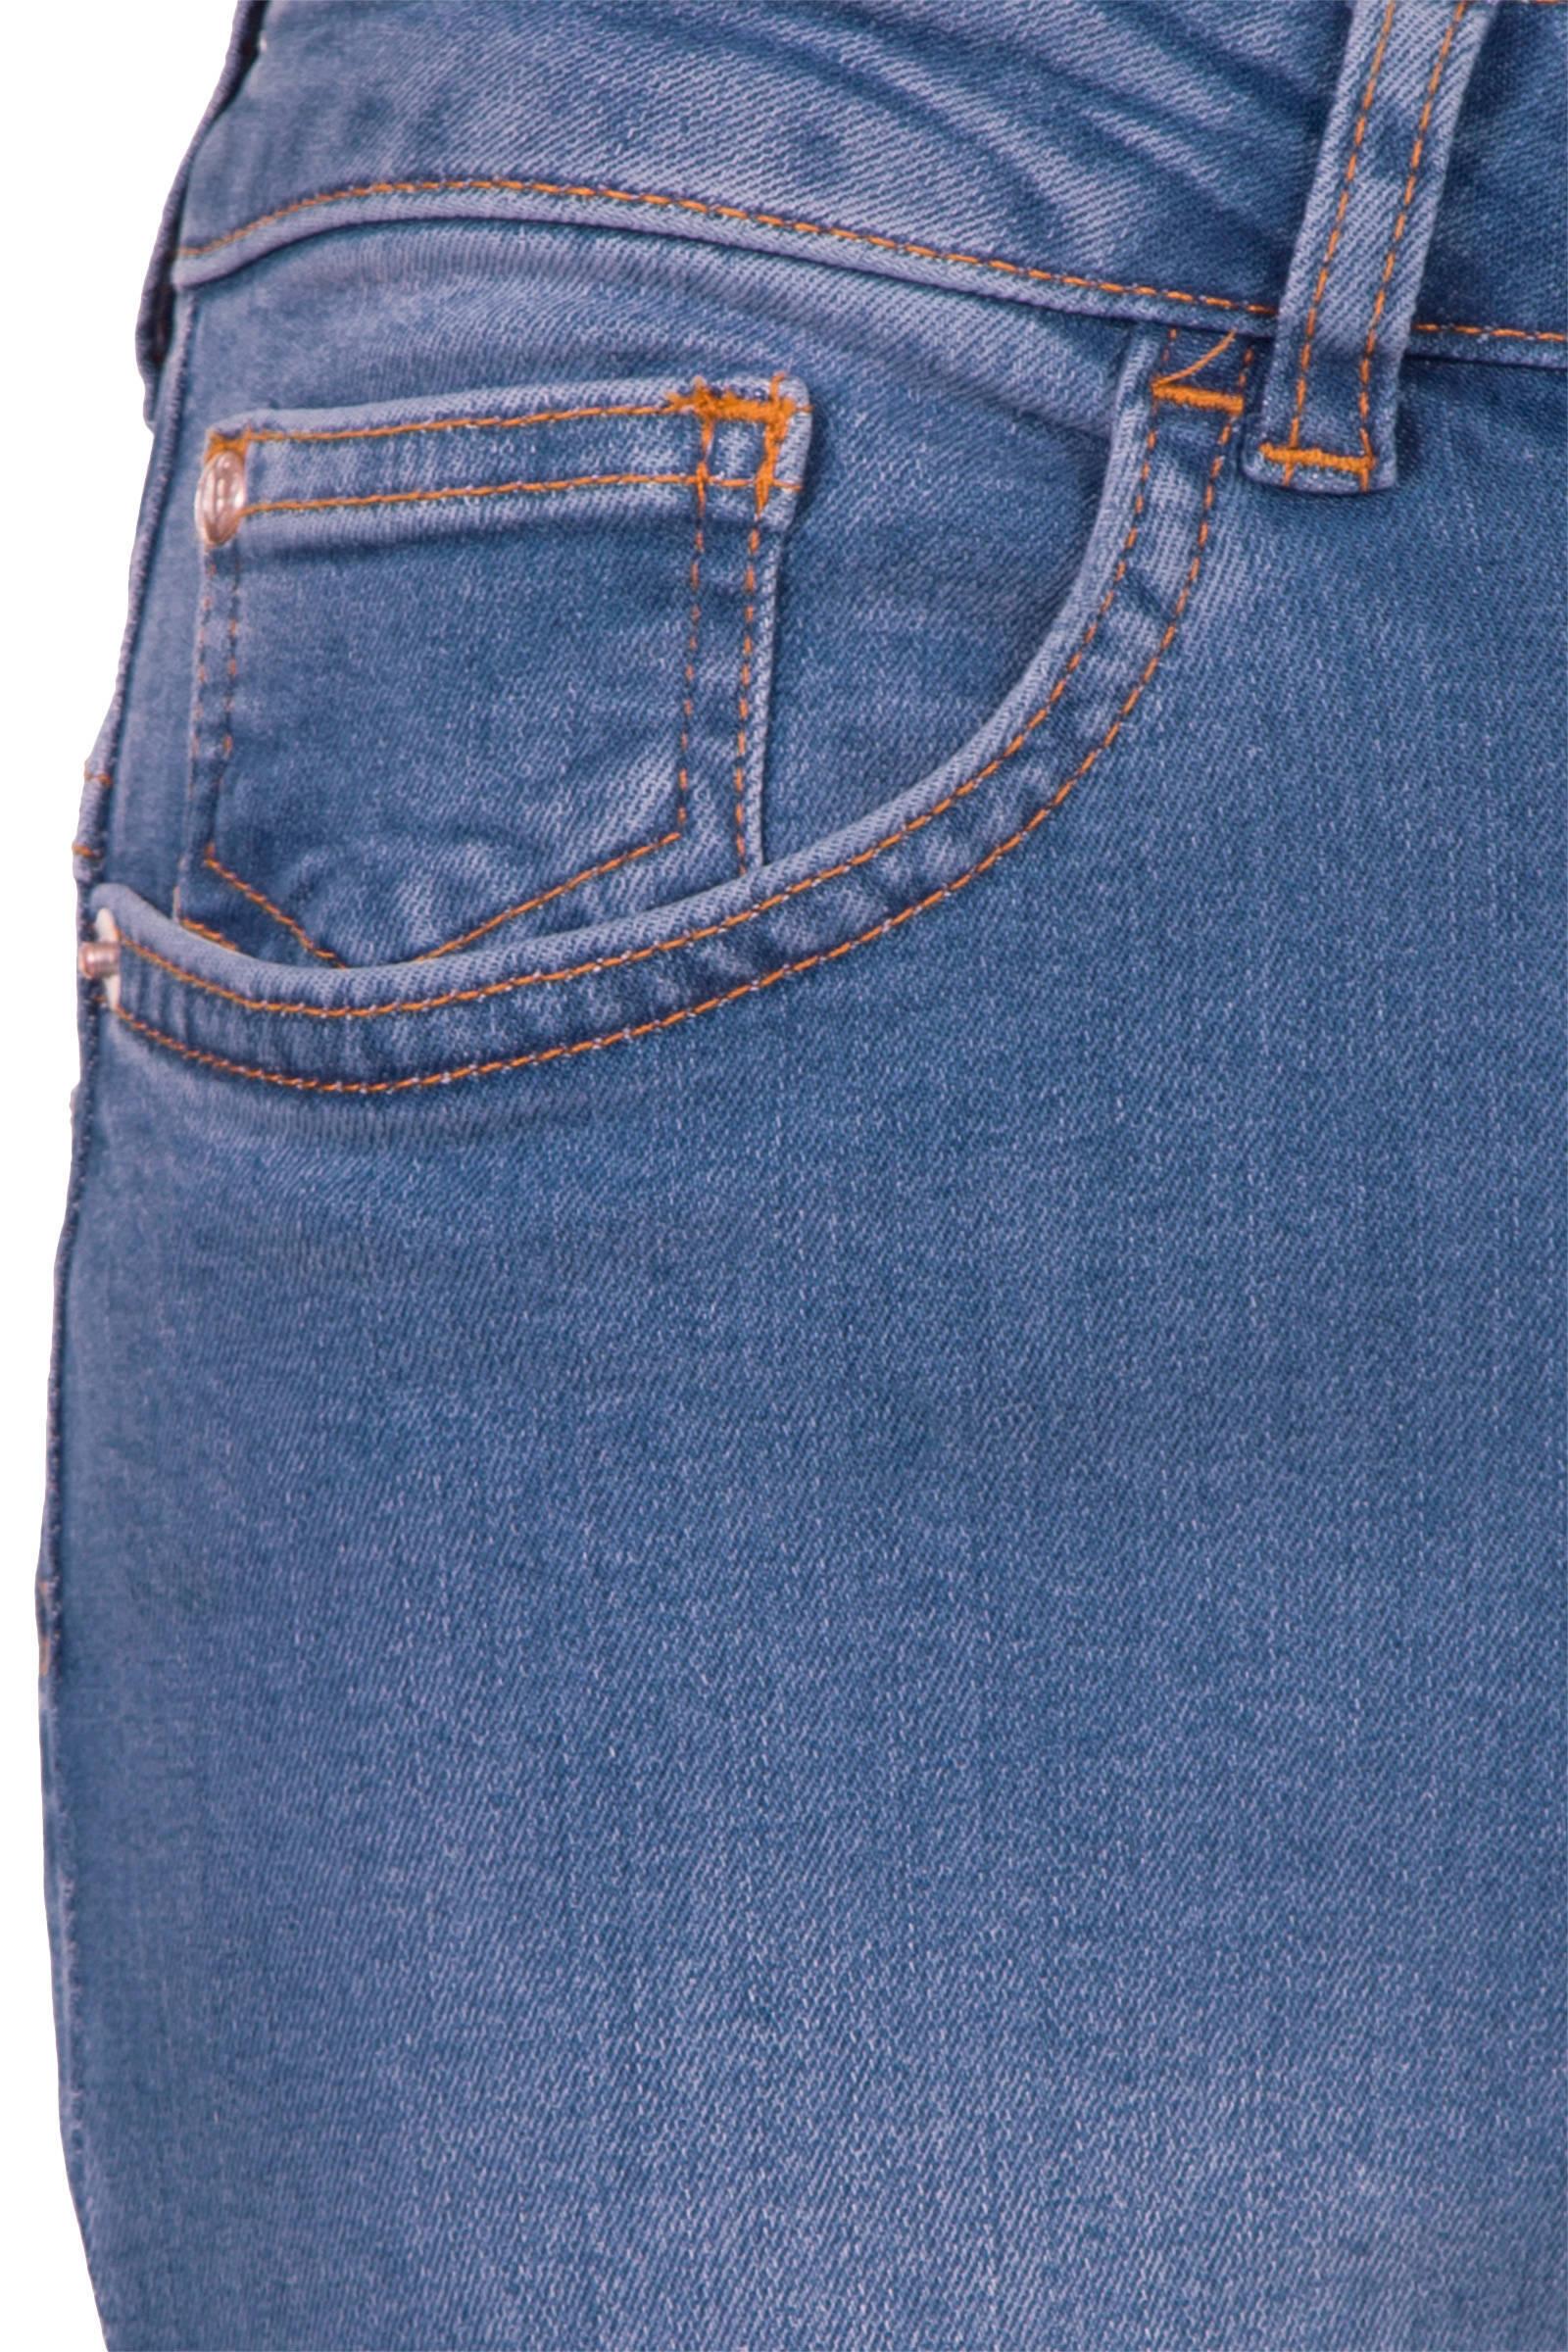 Miss Etam Regulier flared jeans Felize 32 inch blauw | wehkamp